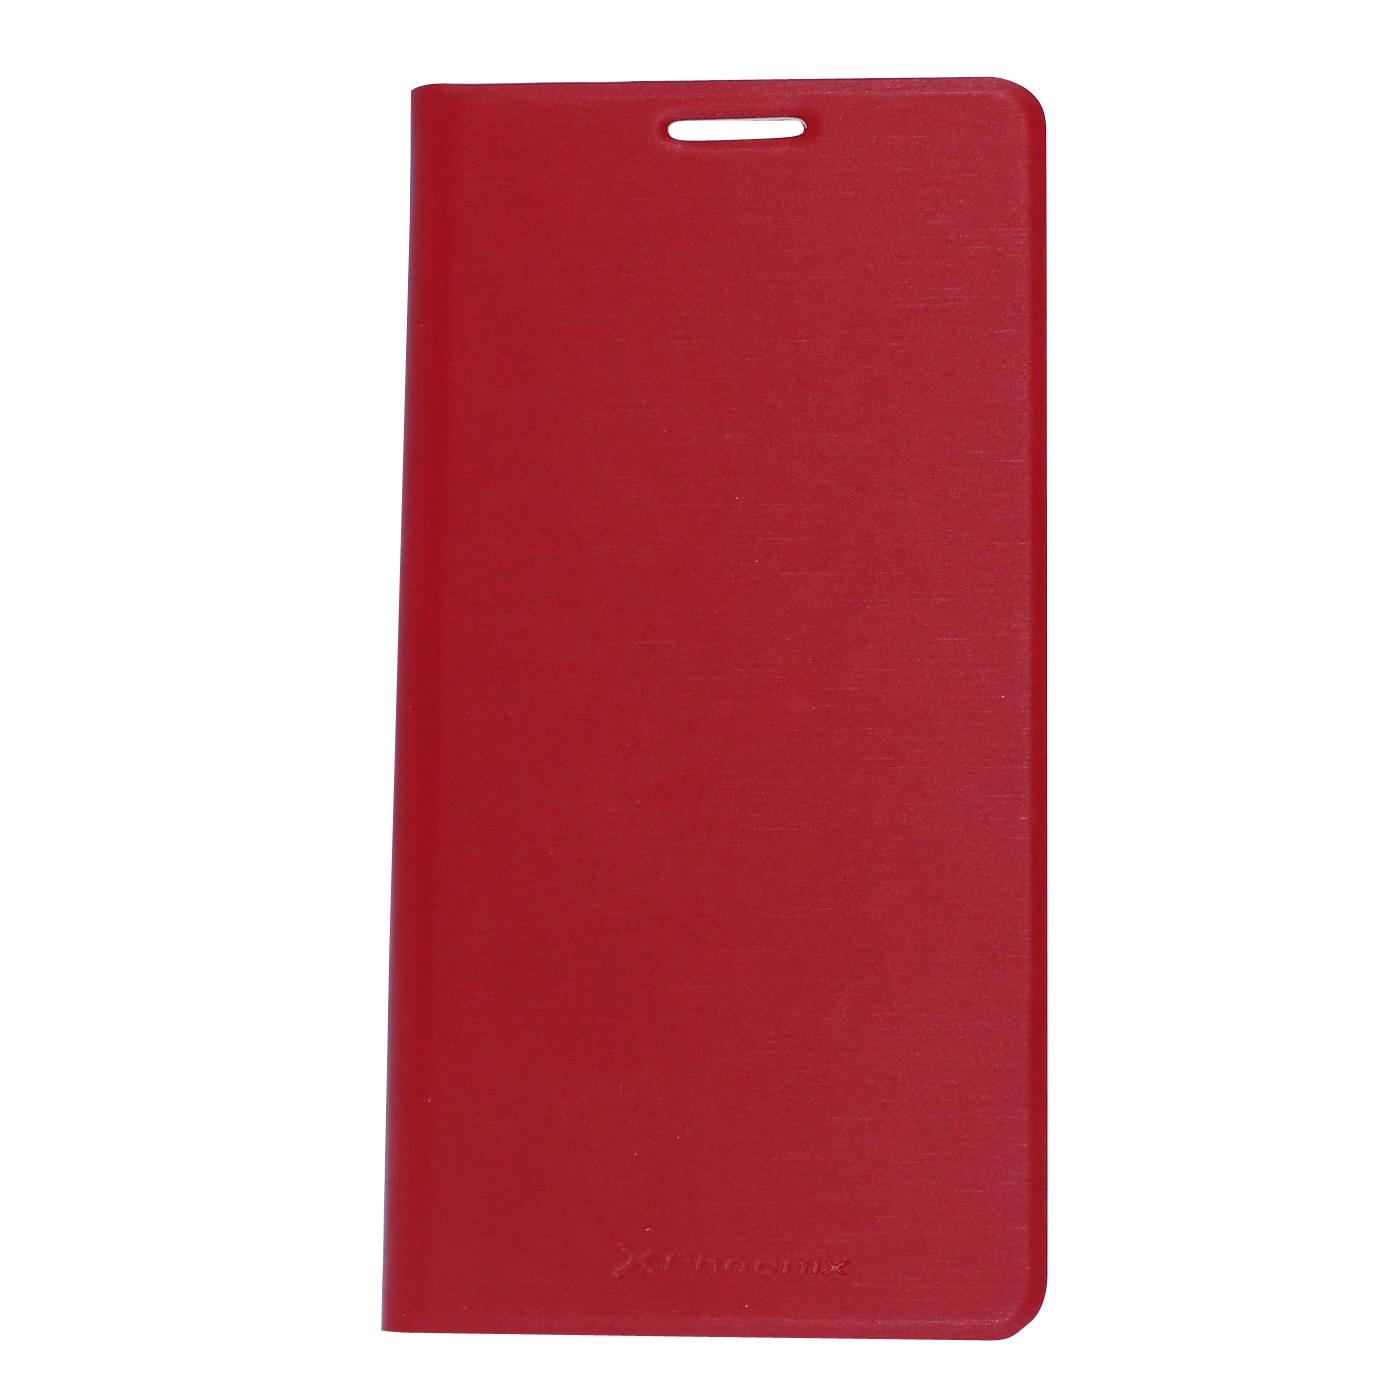 Funda Slim Cover Case Phoenix Para Telefono Smartphone 4.5 Pulgadas Rock Mini Rojo PHROCKXMINICASER